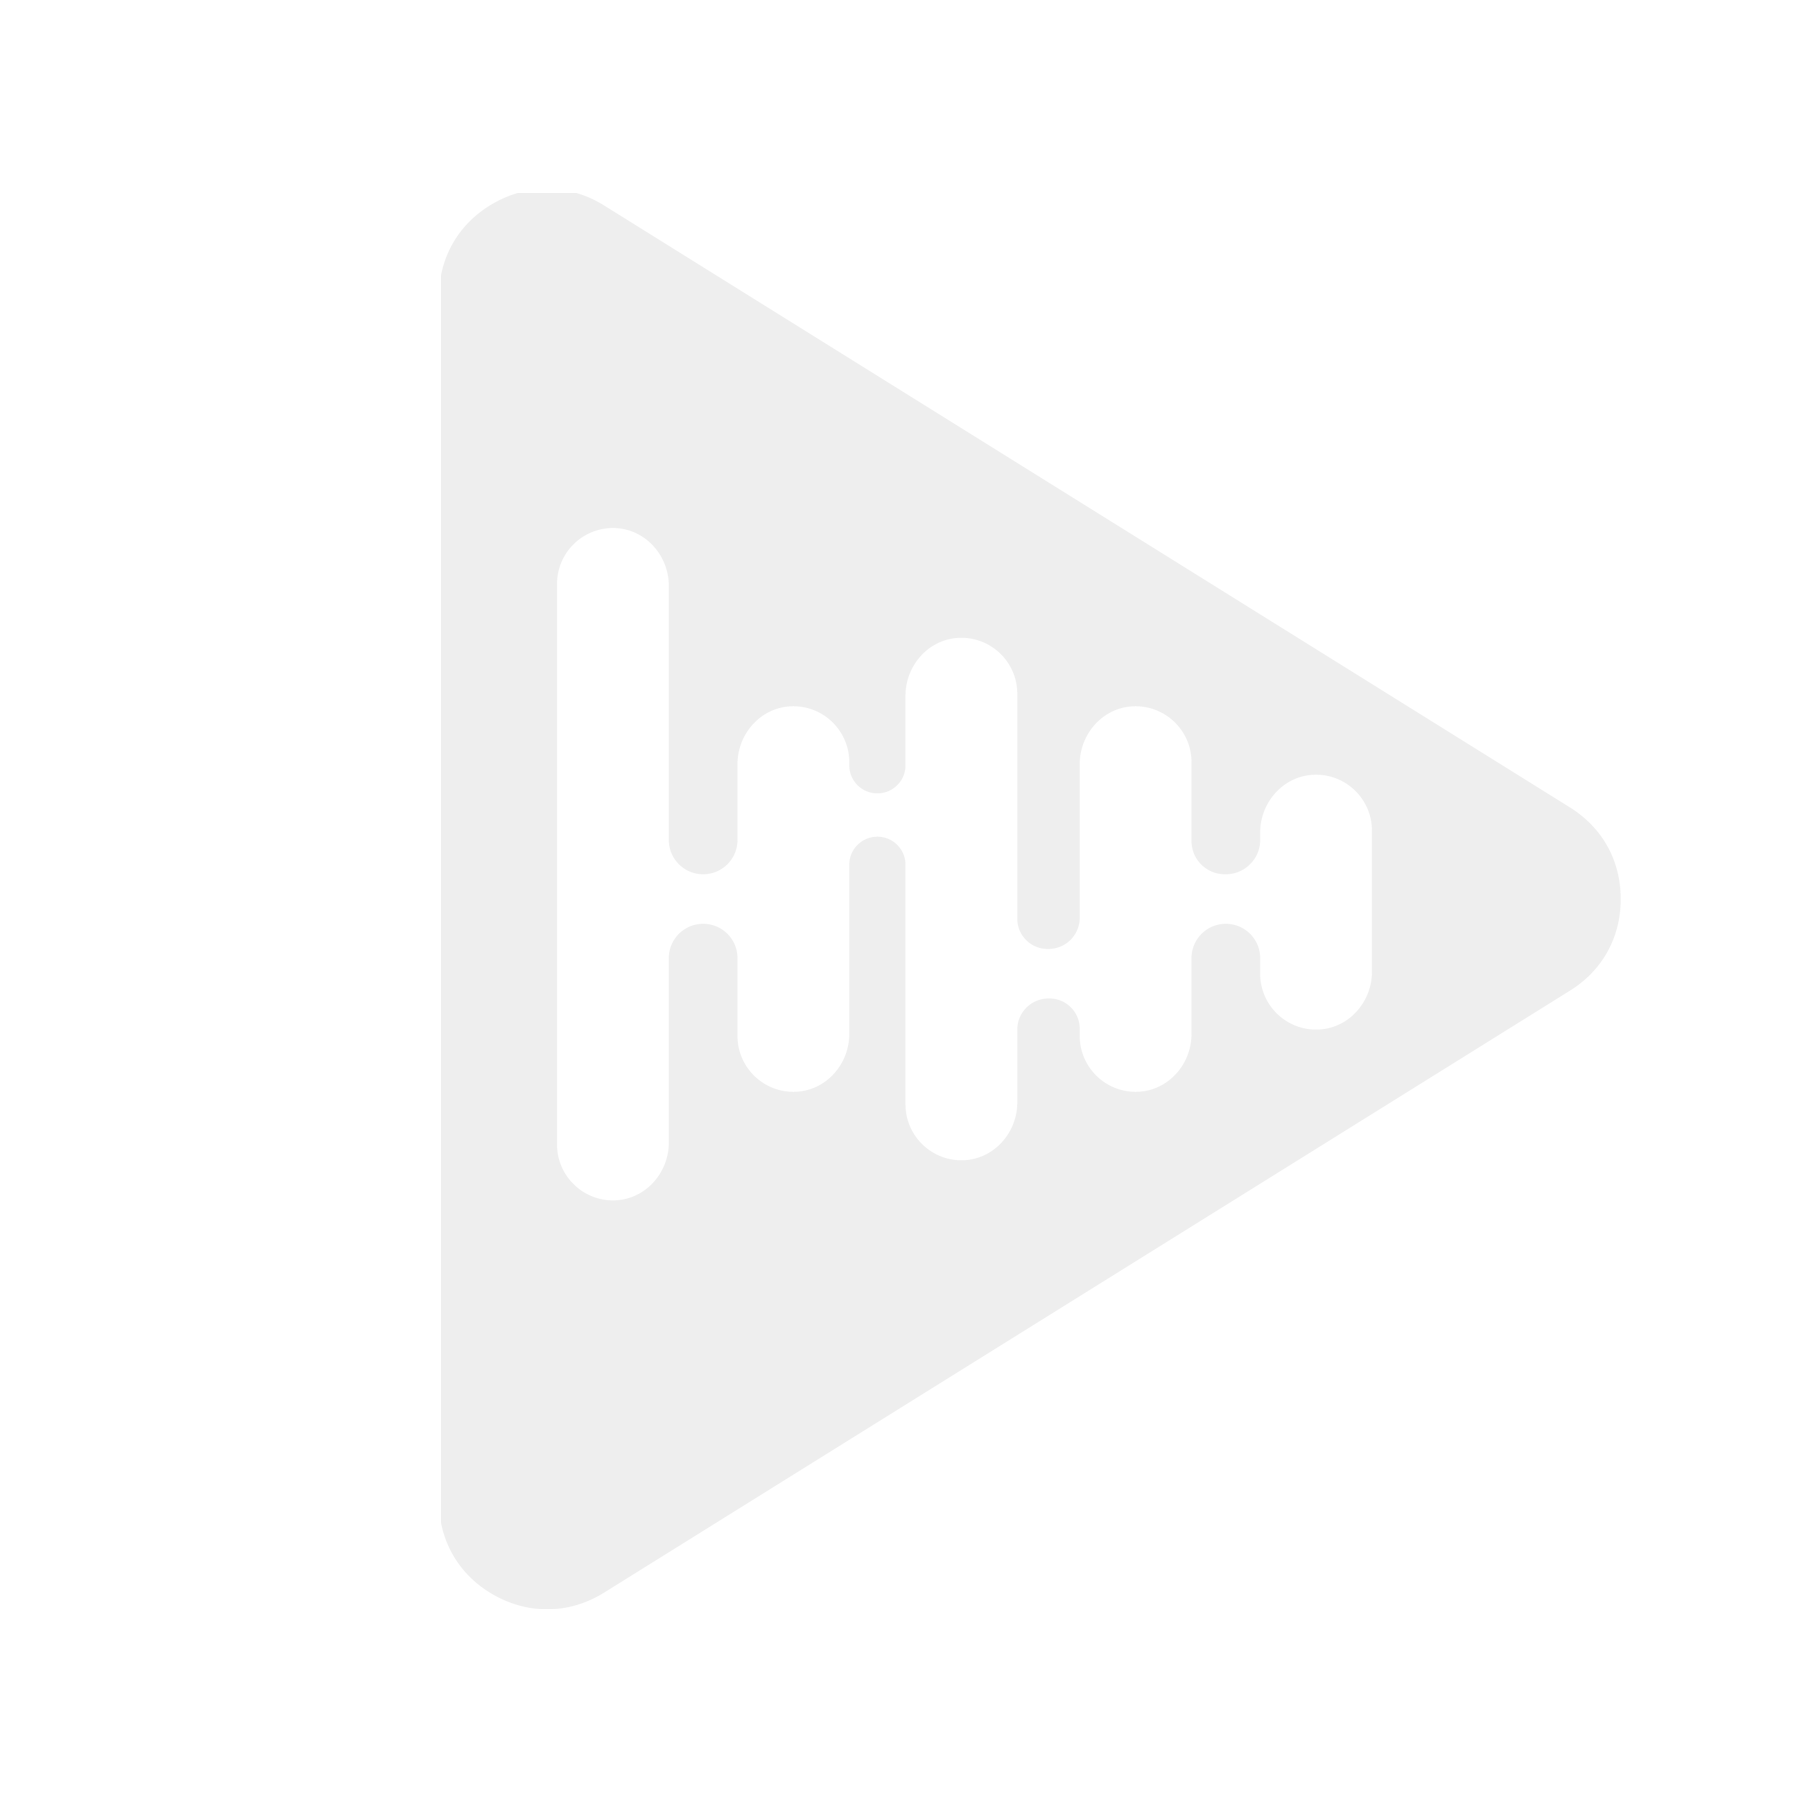 Hertz Uno X 690